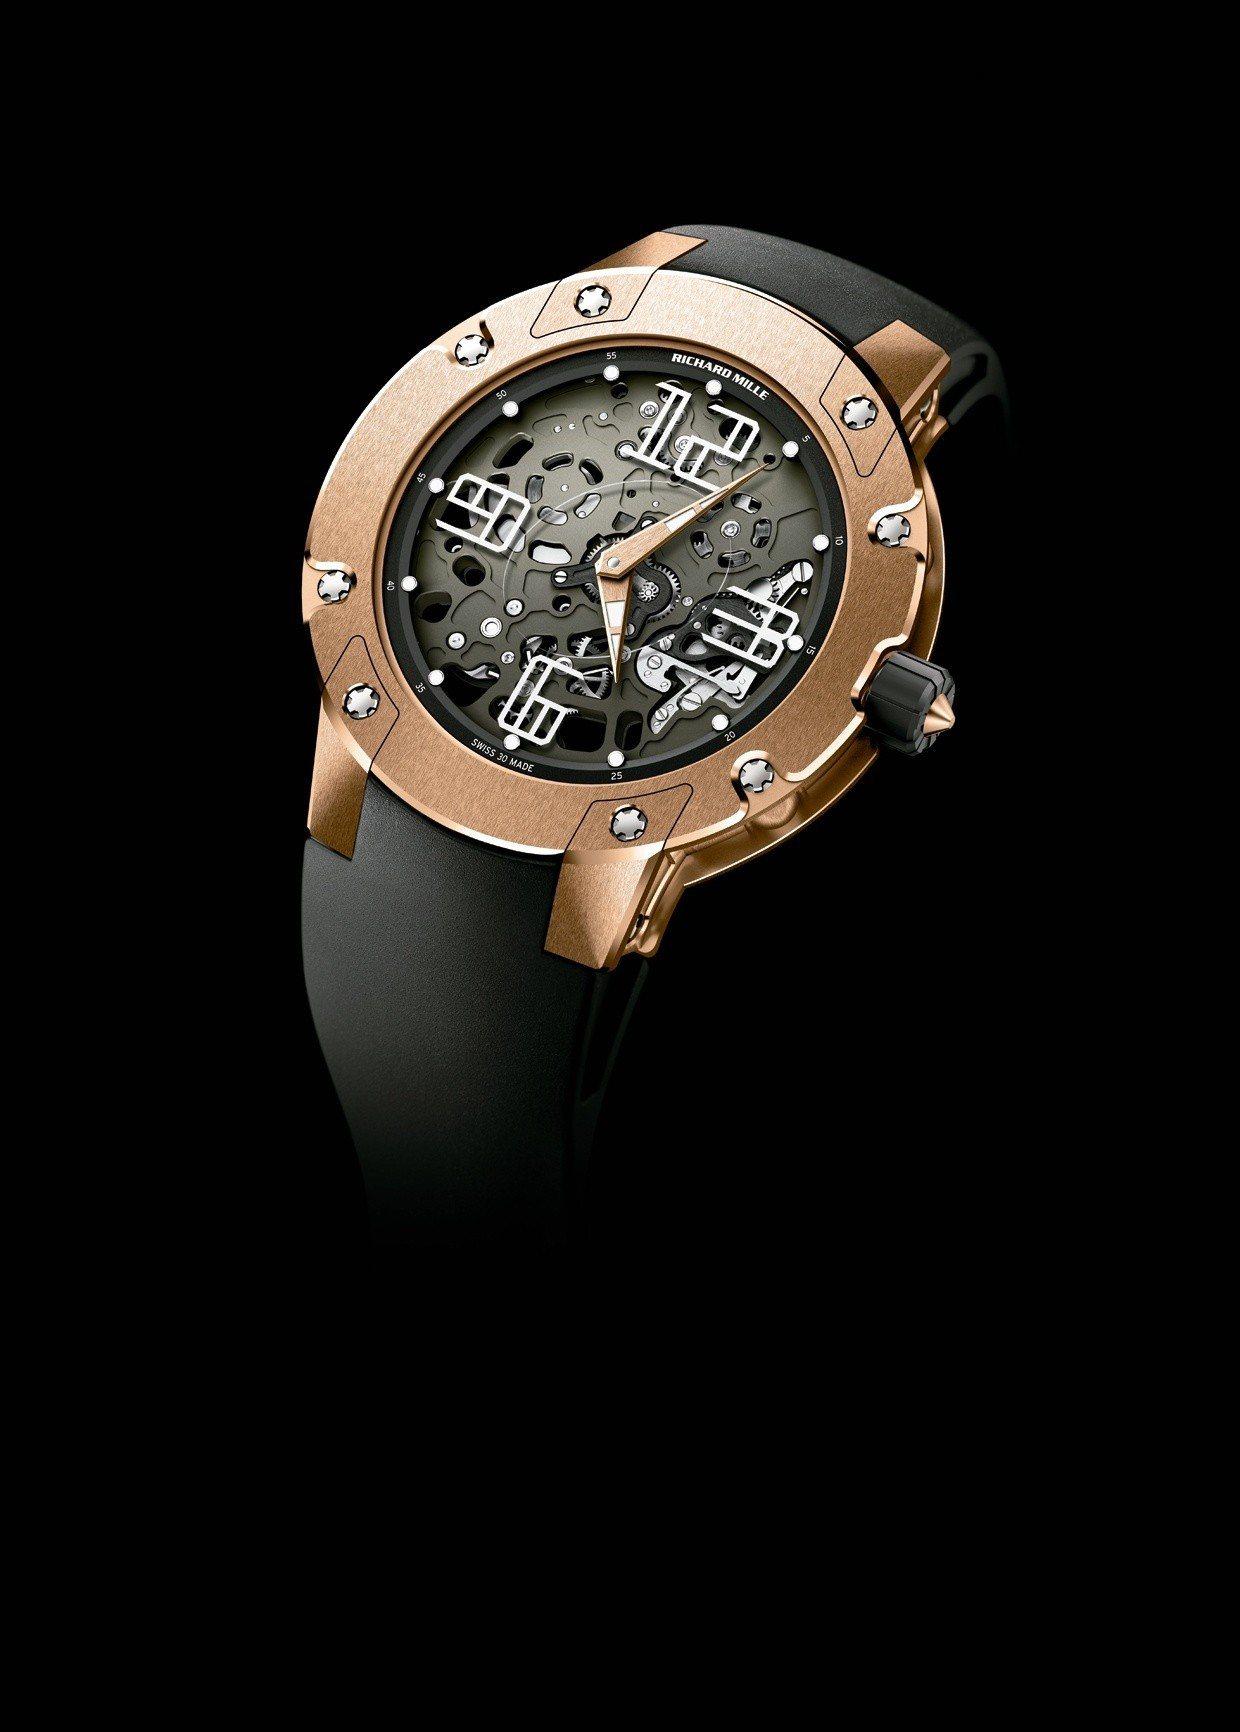 RICHARD MILLE RM033超薄腕表,18K玫瑰金表壳,搭载镂空RMX...